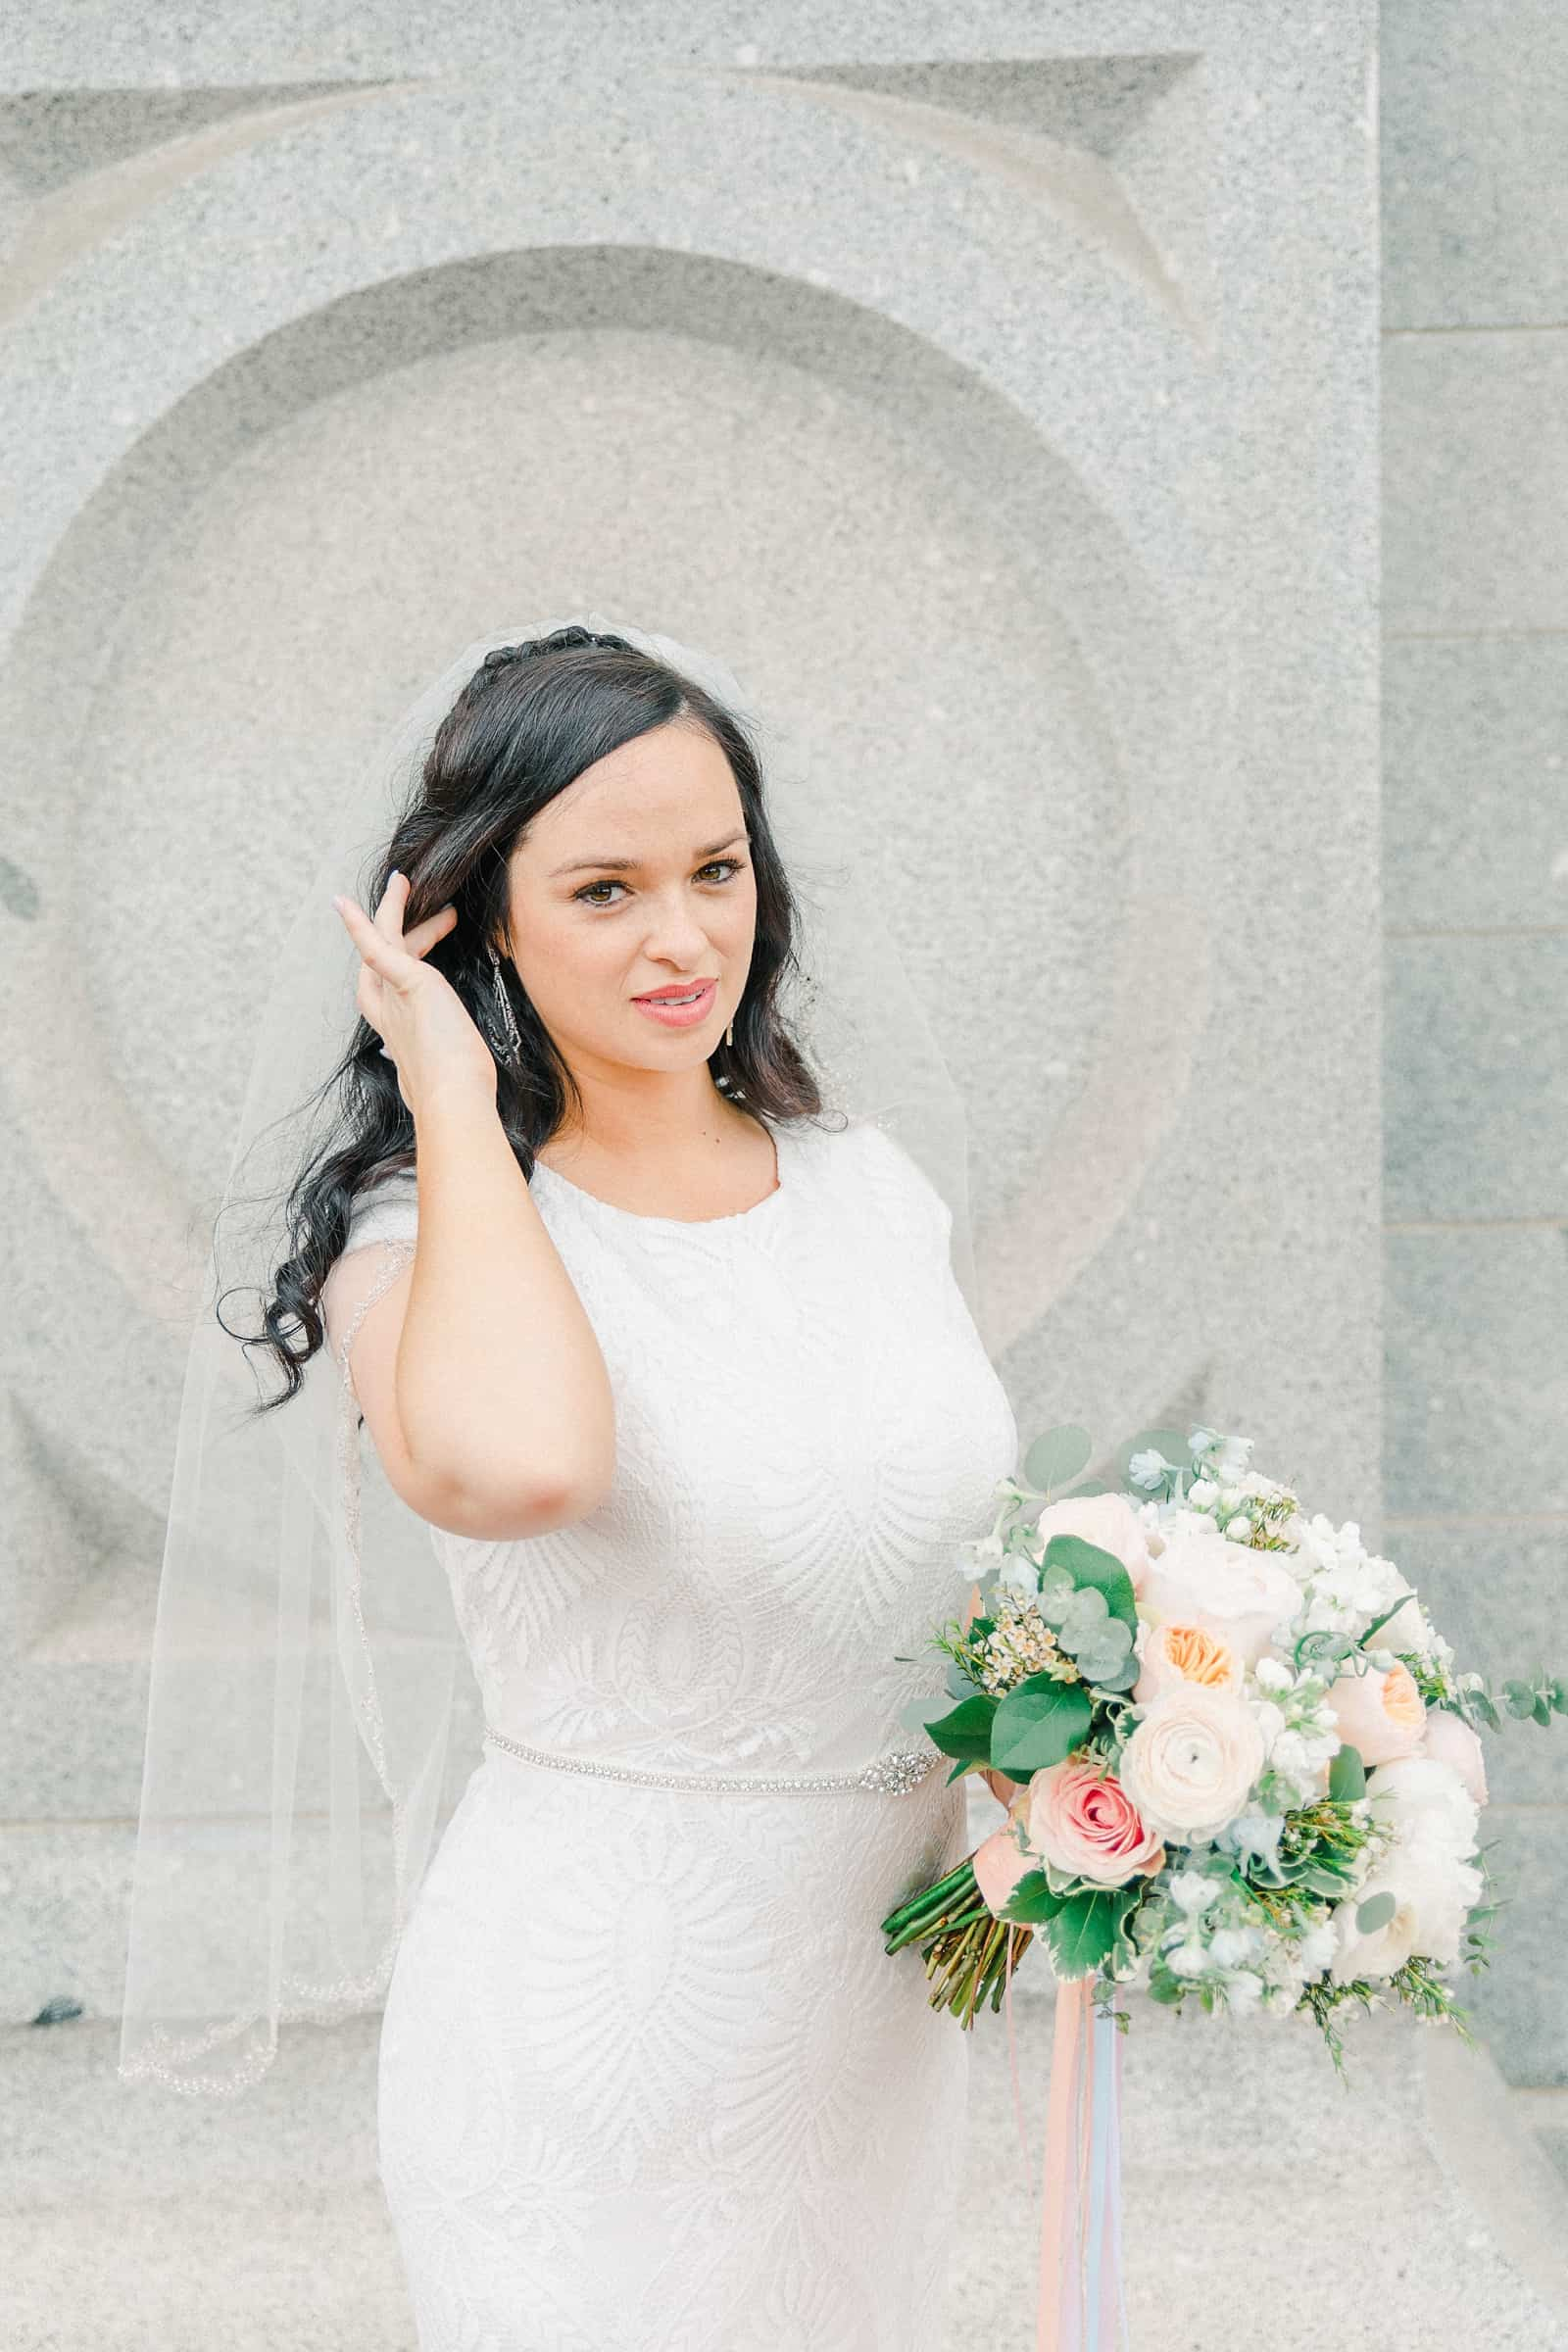 Thomas S. Monson Center Wedding, Salt Lake LDS Temple Wedding, Utah wedding photography. bride in modest lace wedding dress with veil, pink and white flowers wedding bouquet